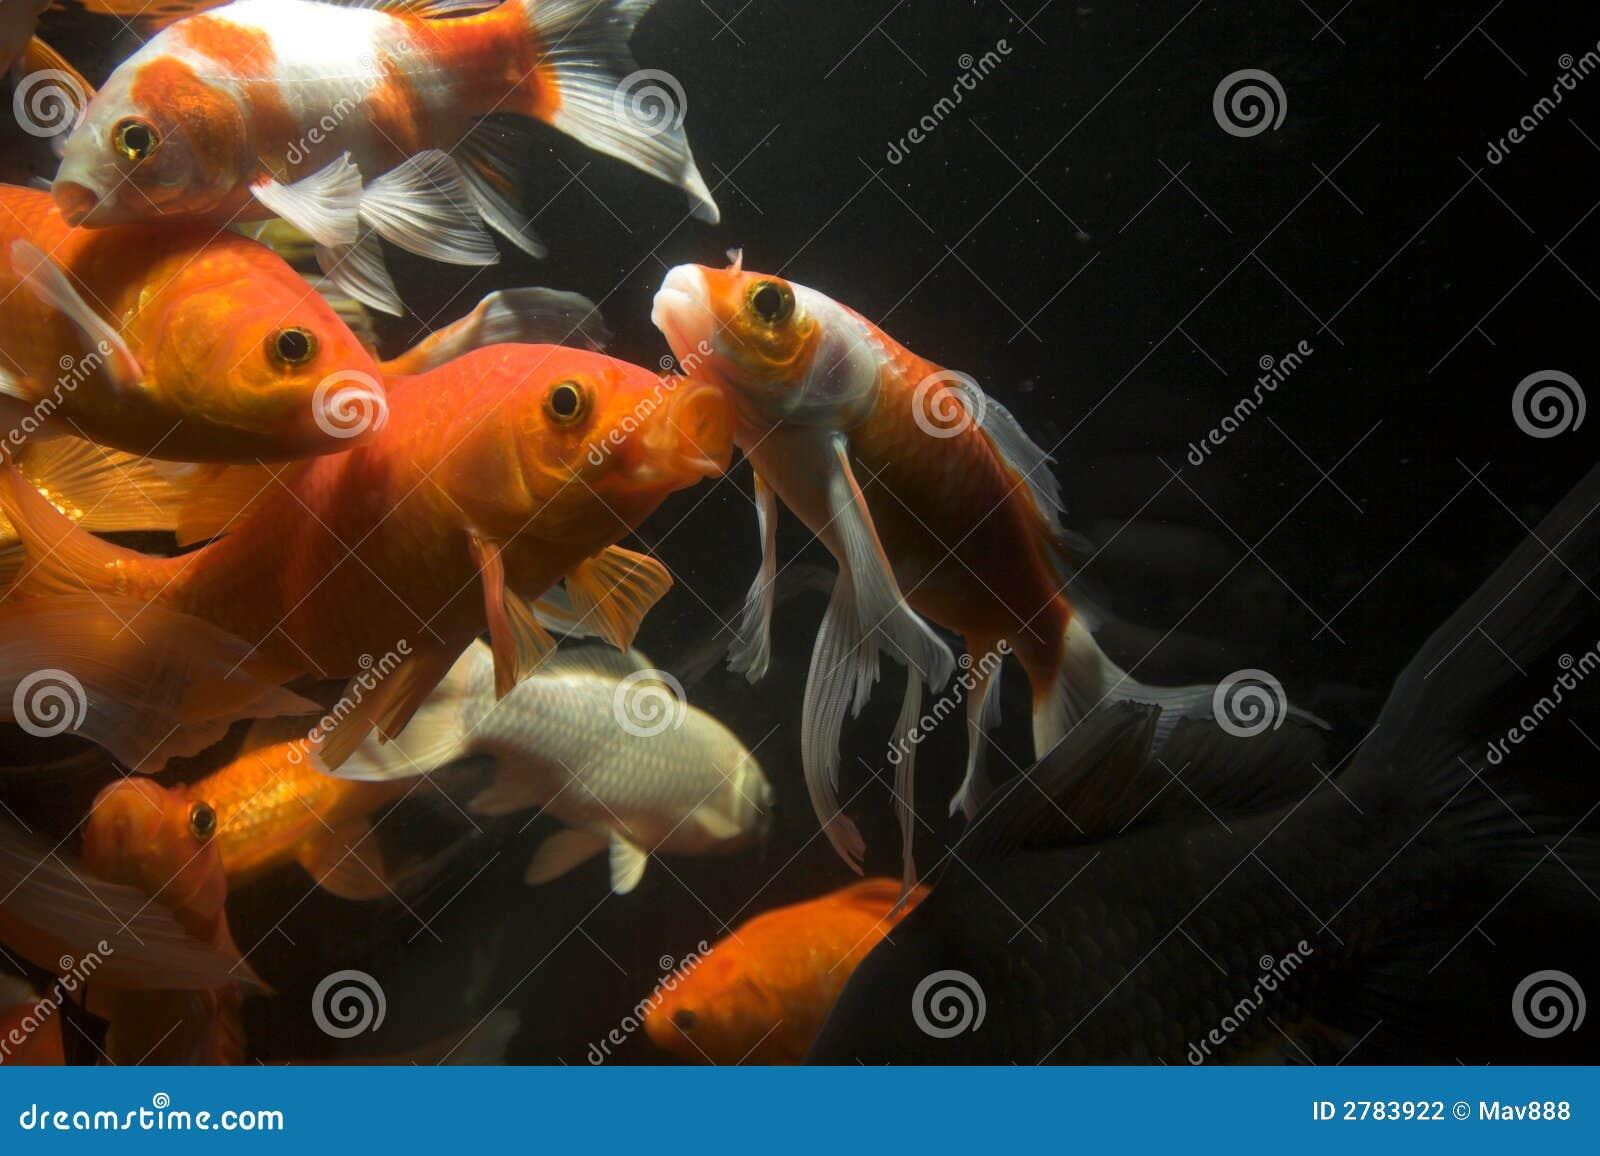 Koi fish underwater stock photo image of black japan for Koi fish photos